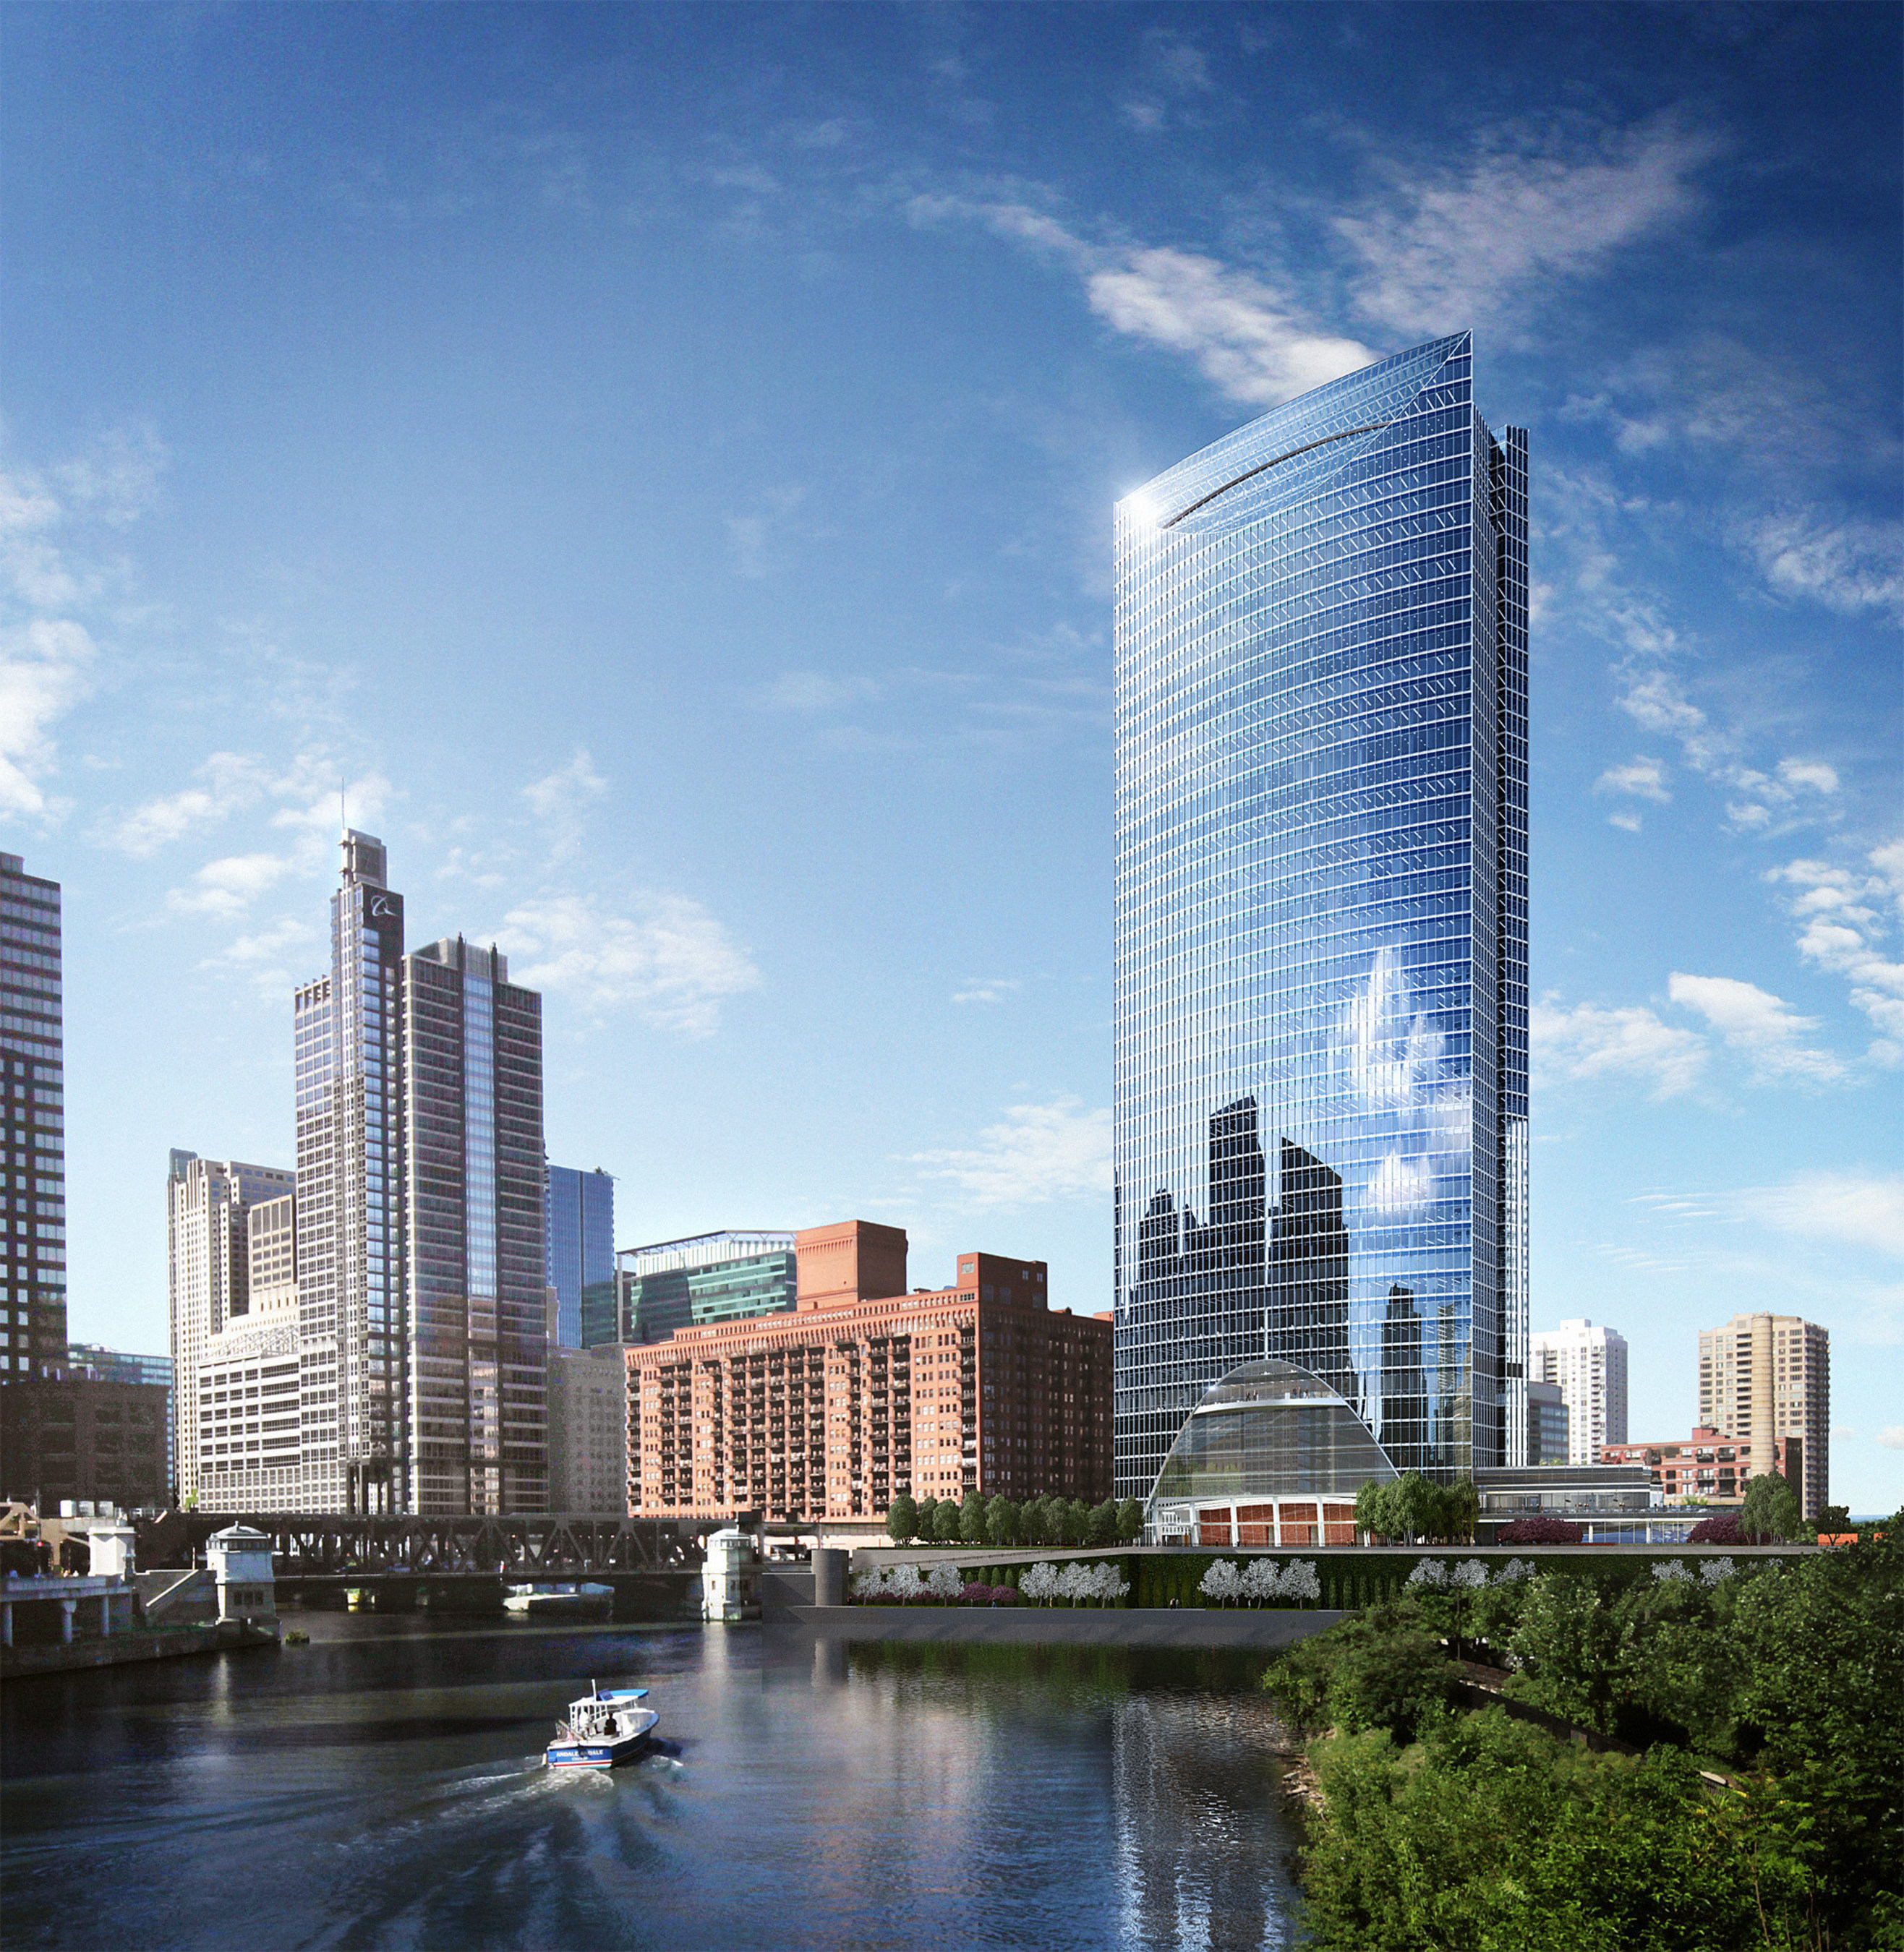 City Of Morton Illinois: Morton Salt To Move Headquarters To New Downtown Chicago